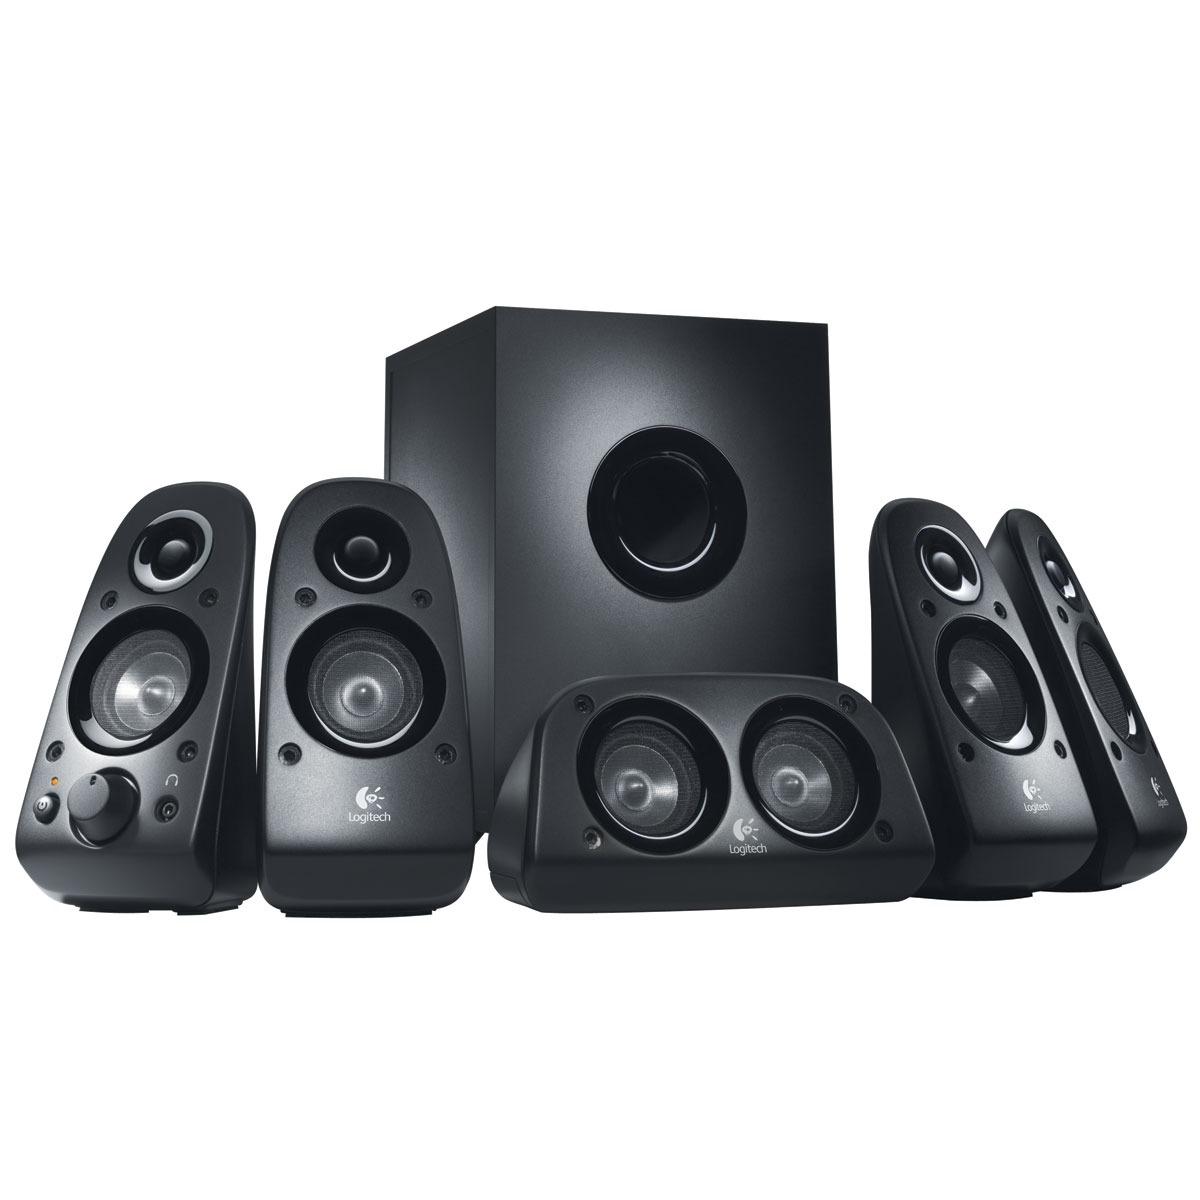 Enceinte PC Logitech Speaker System Z506 Ensemble 5.1 - 75 Watts - Jack 3.5 mm - compatible PS3 / Xbox 360 / Wii et iPod